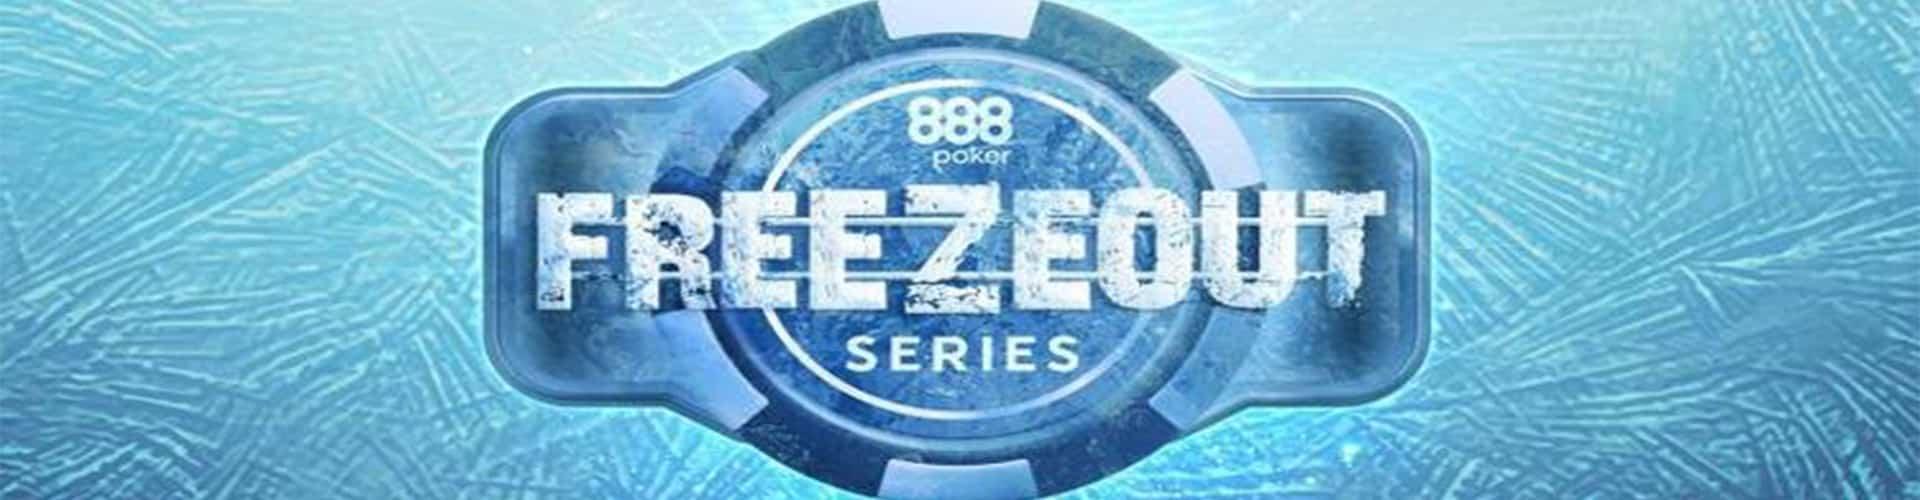 888 freezout series